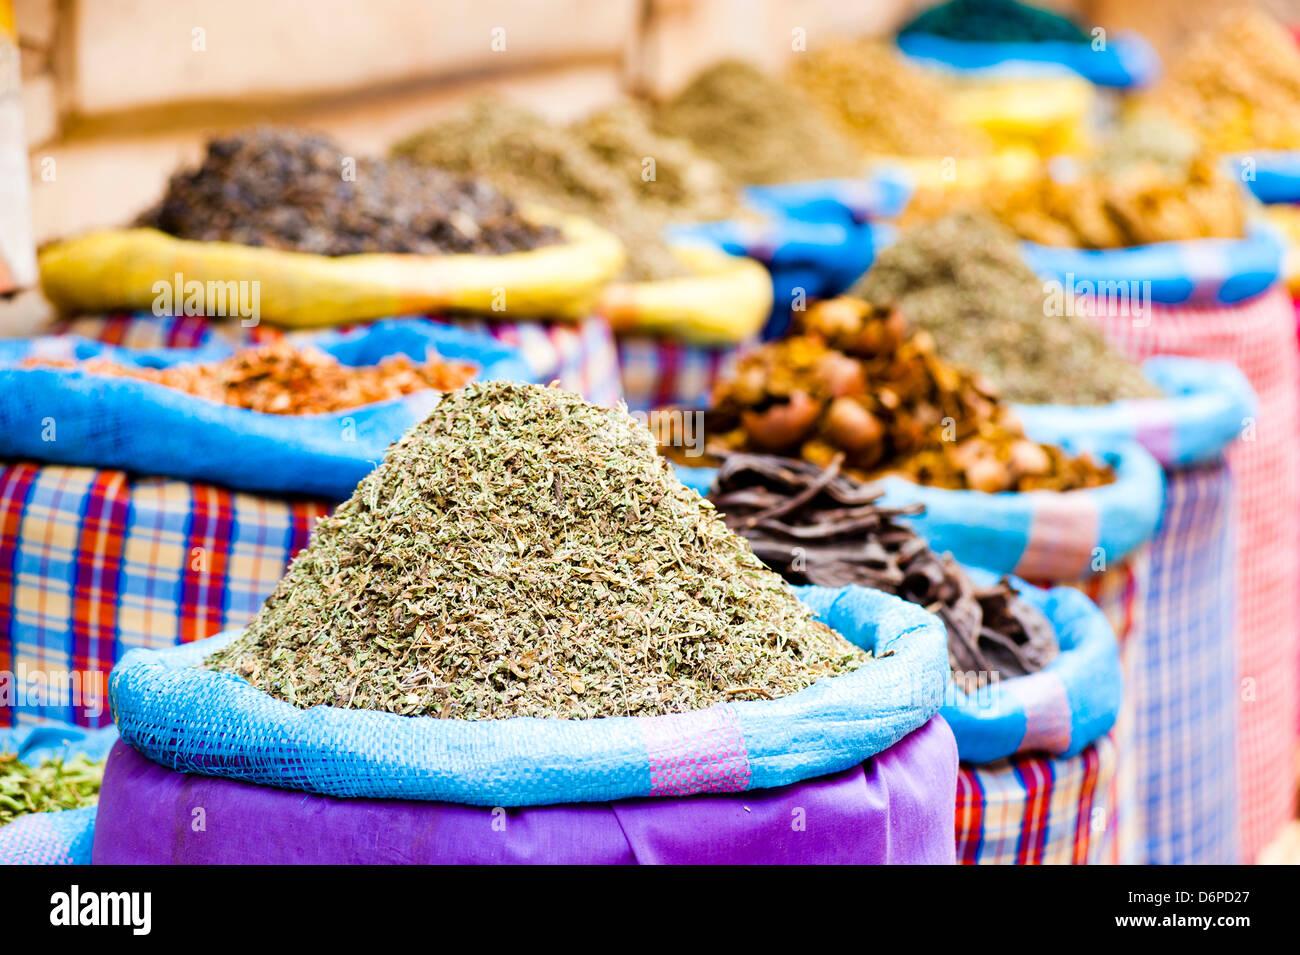 Spezie colorate nei souks appena fuori da Djemaa El Fna a Marrakech, Marocco, Africa Settentrionale, Africa Immagini Stock